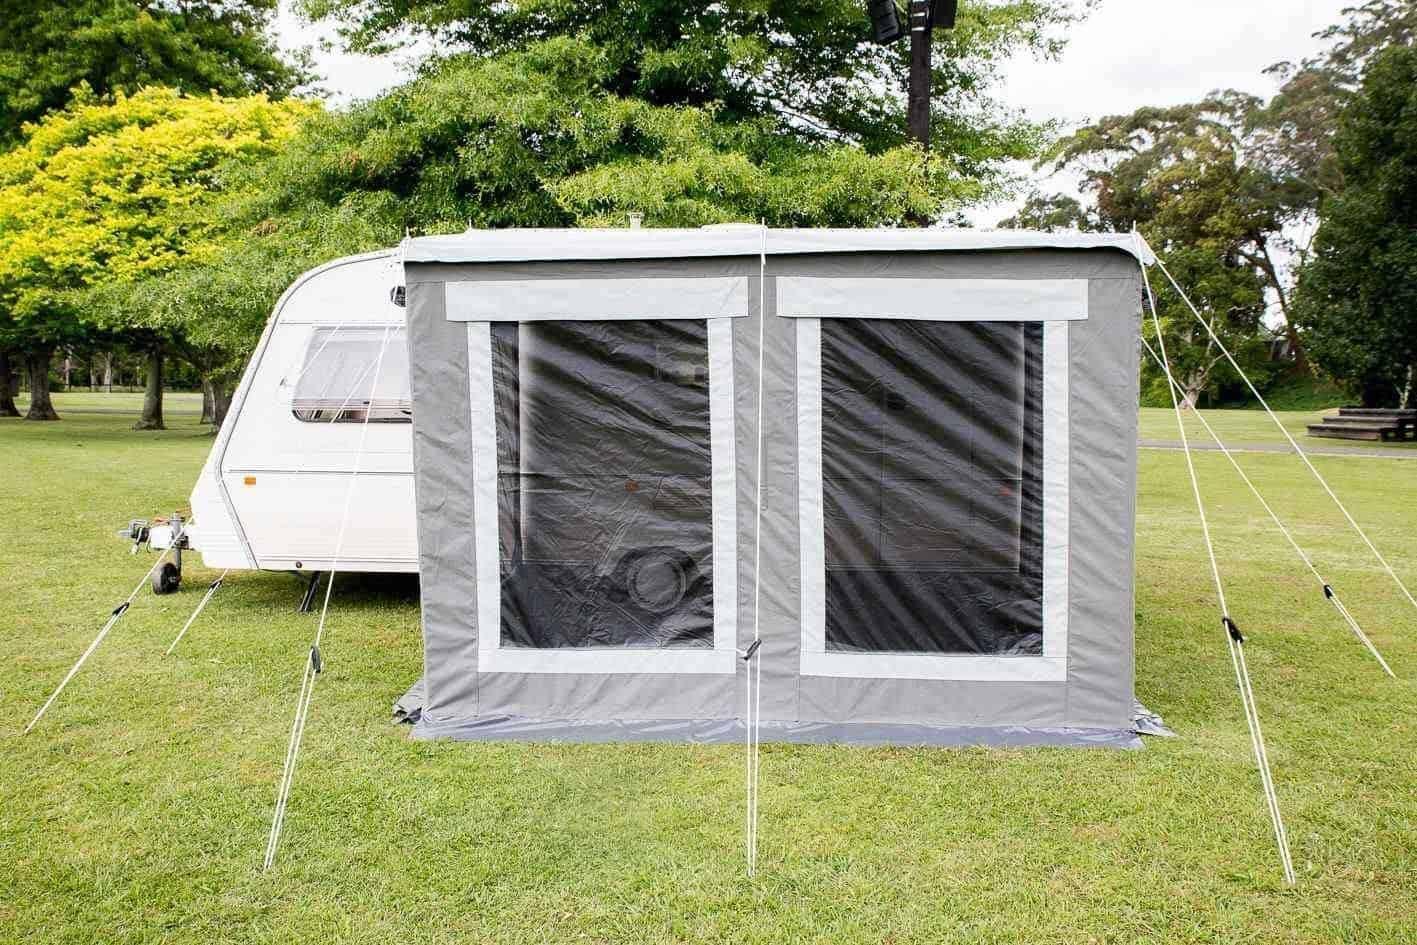 Universal Awning 2.5m x 2.2m - Choose for NZ or EU Caravan ...